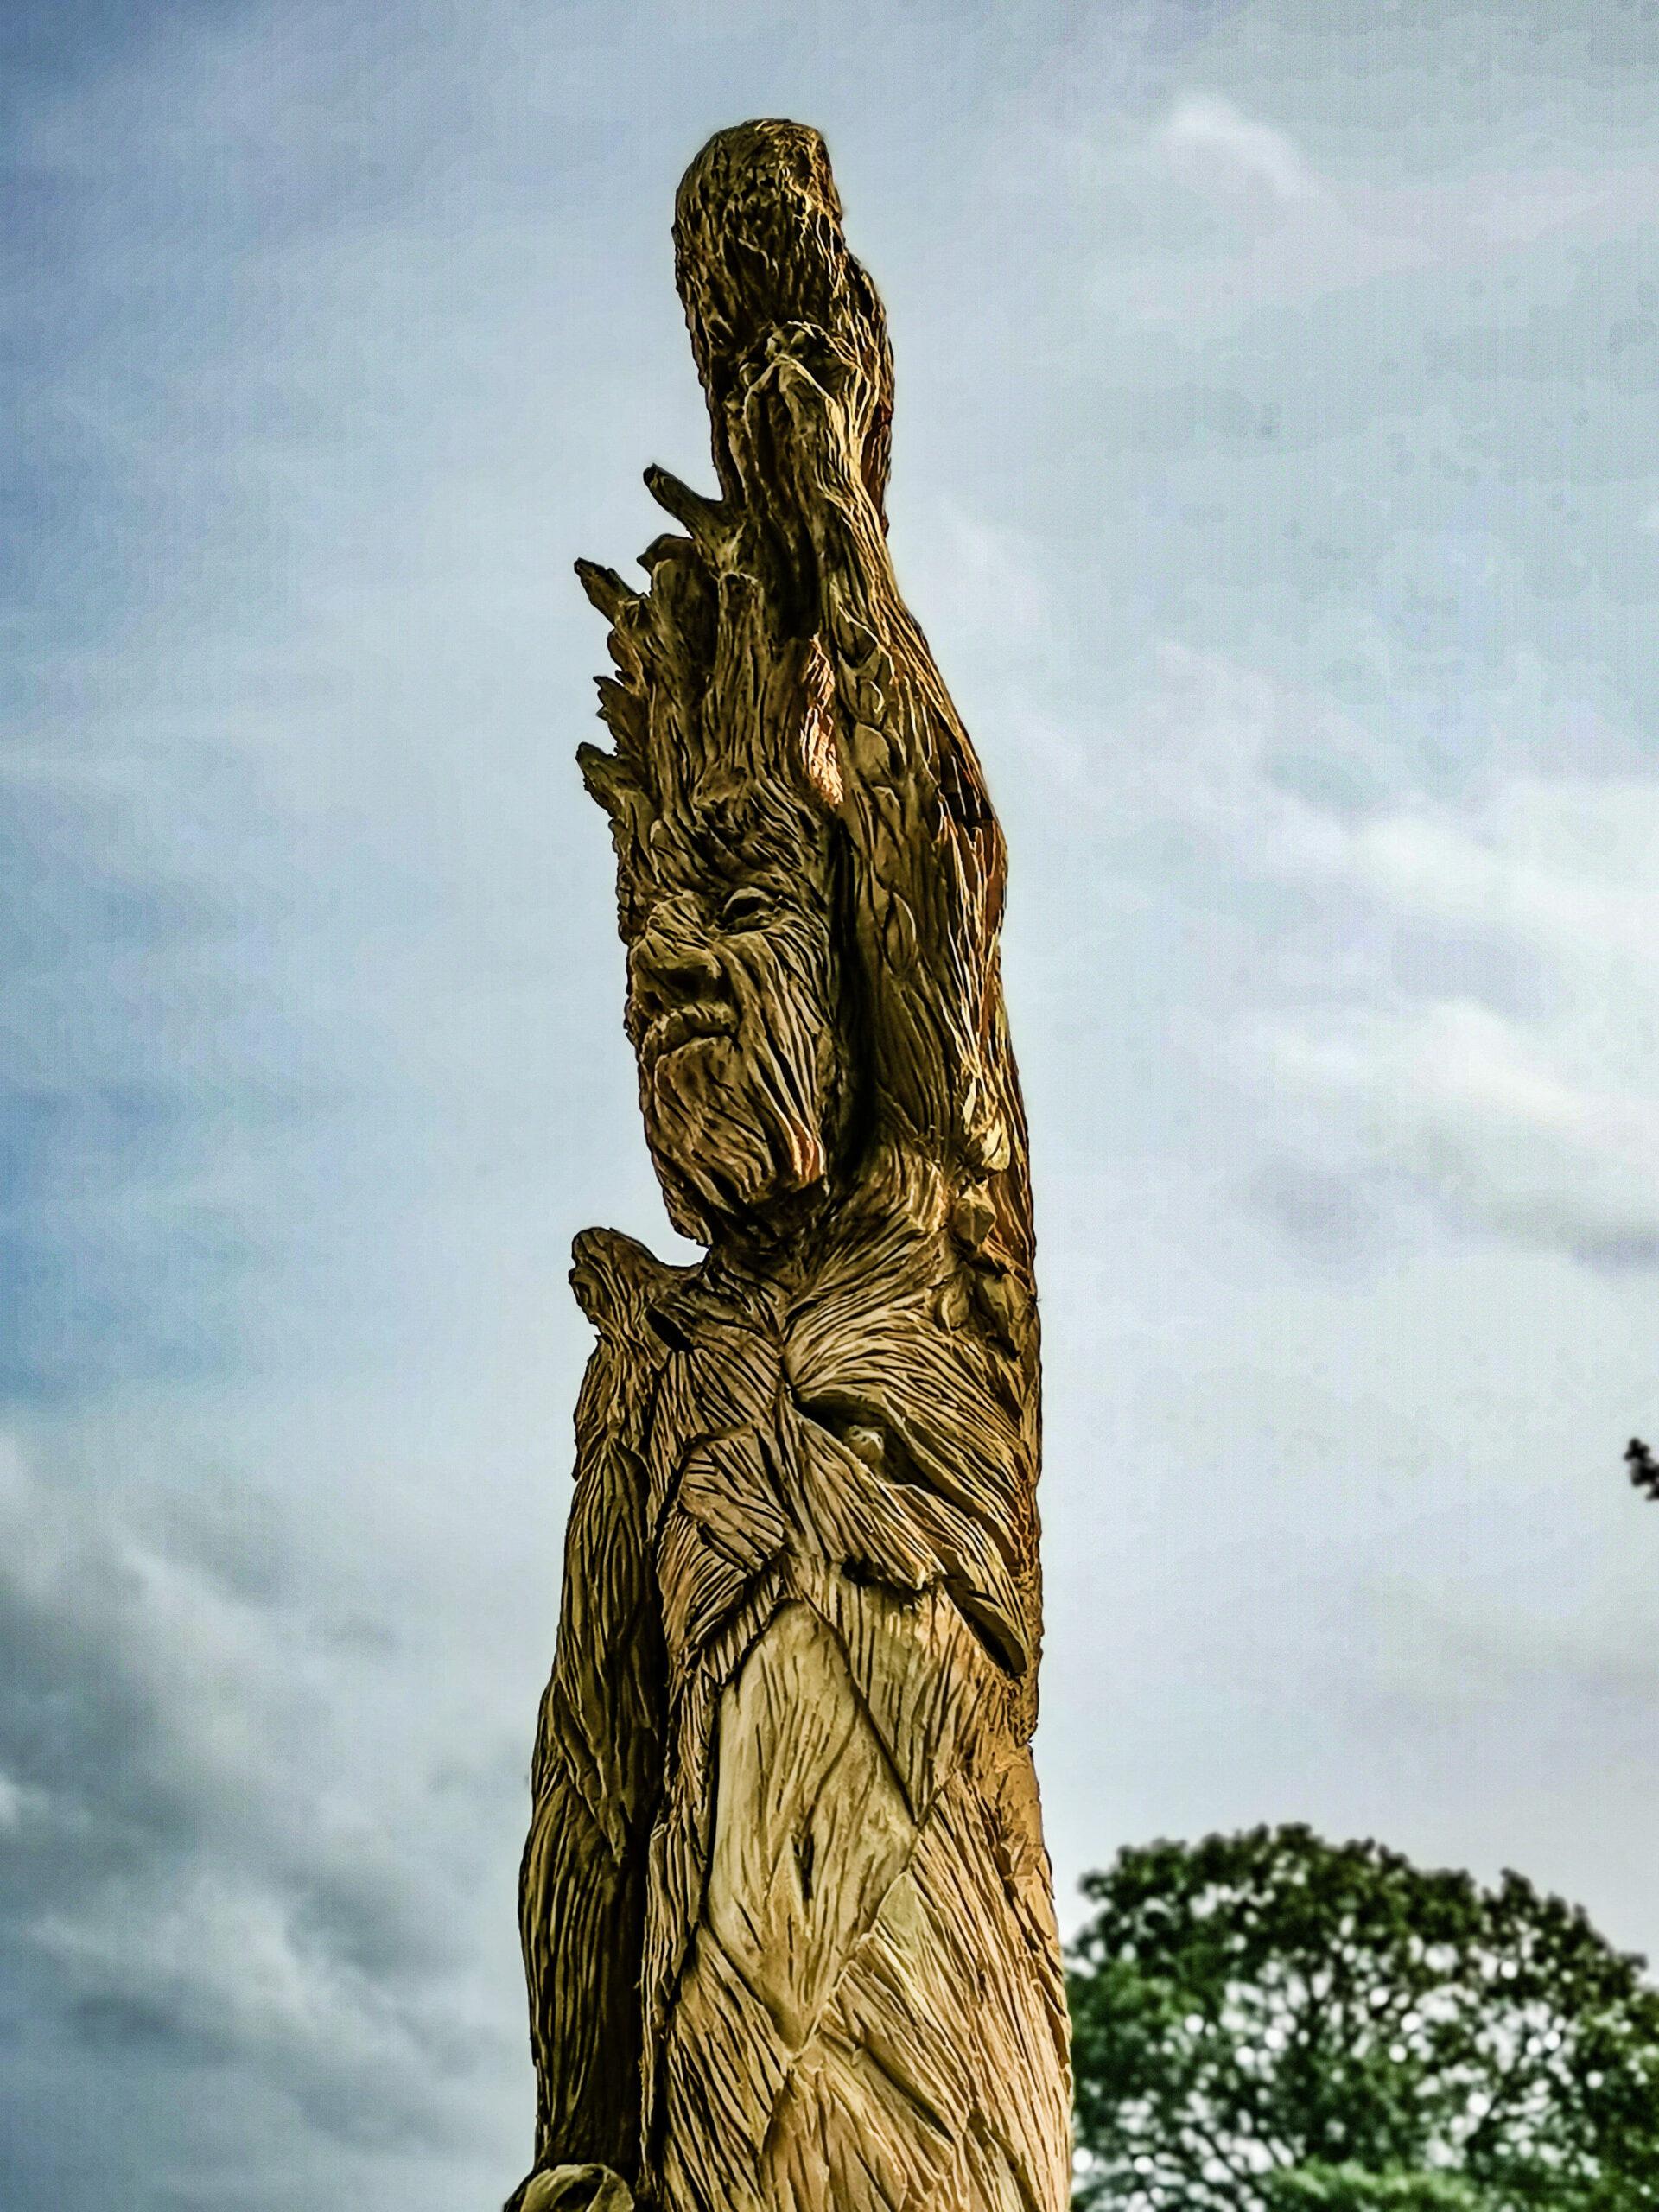 ent sculpture by simon o'rourke at poulton hall